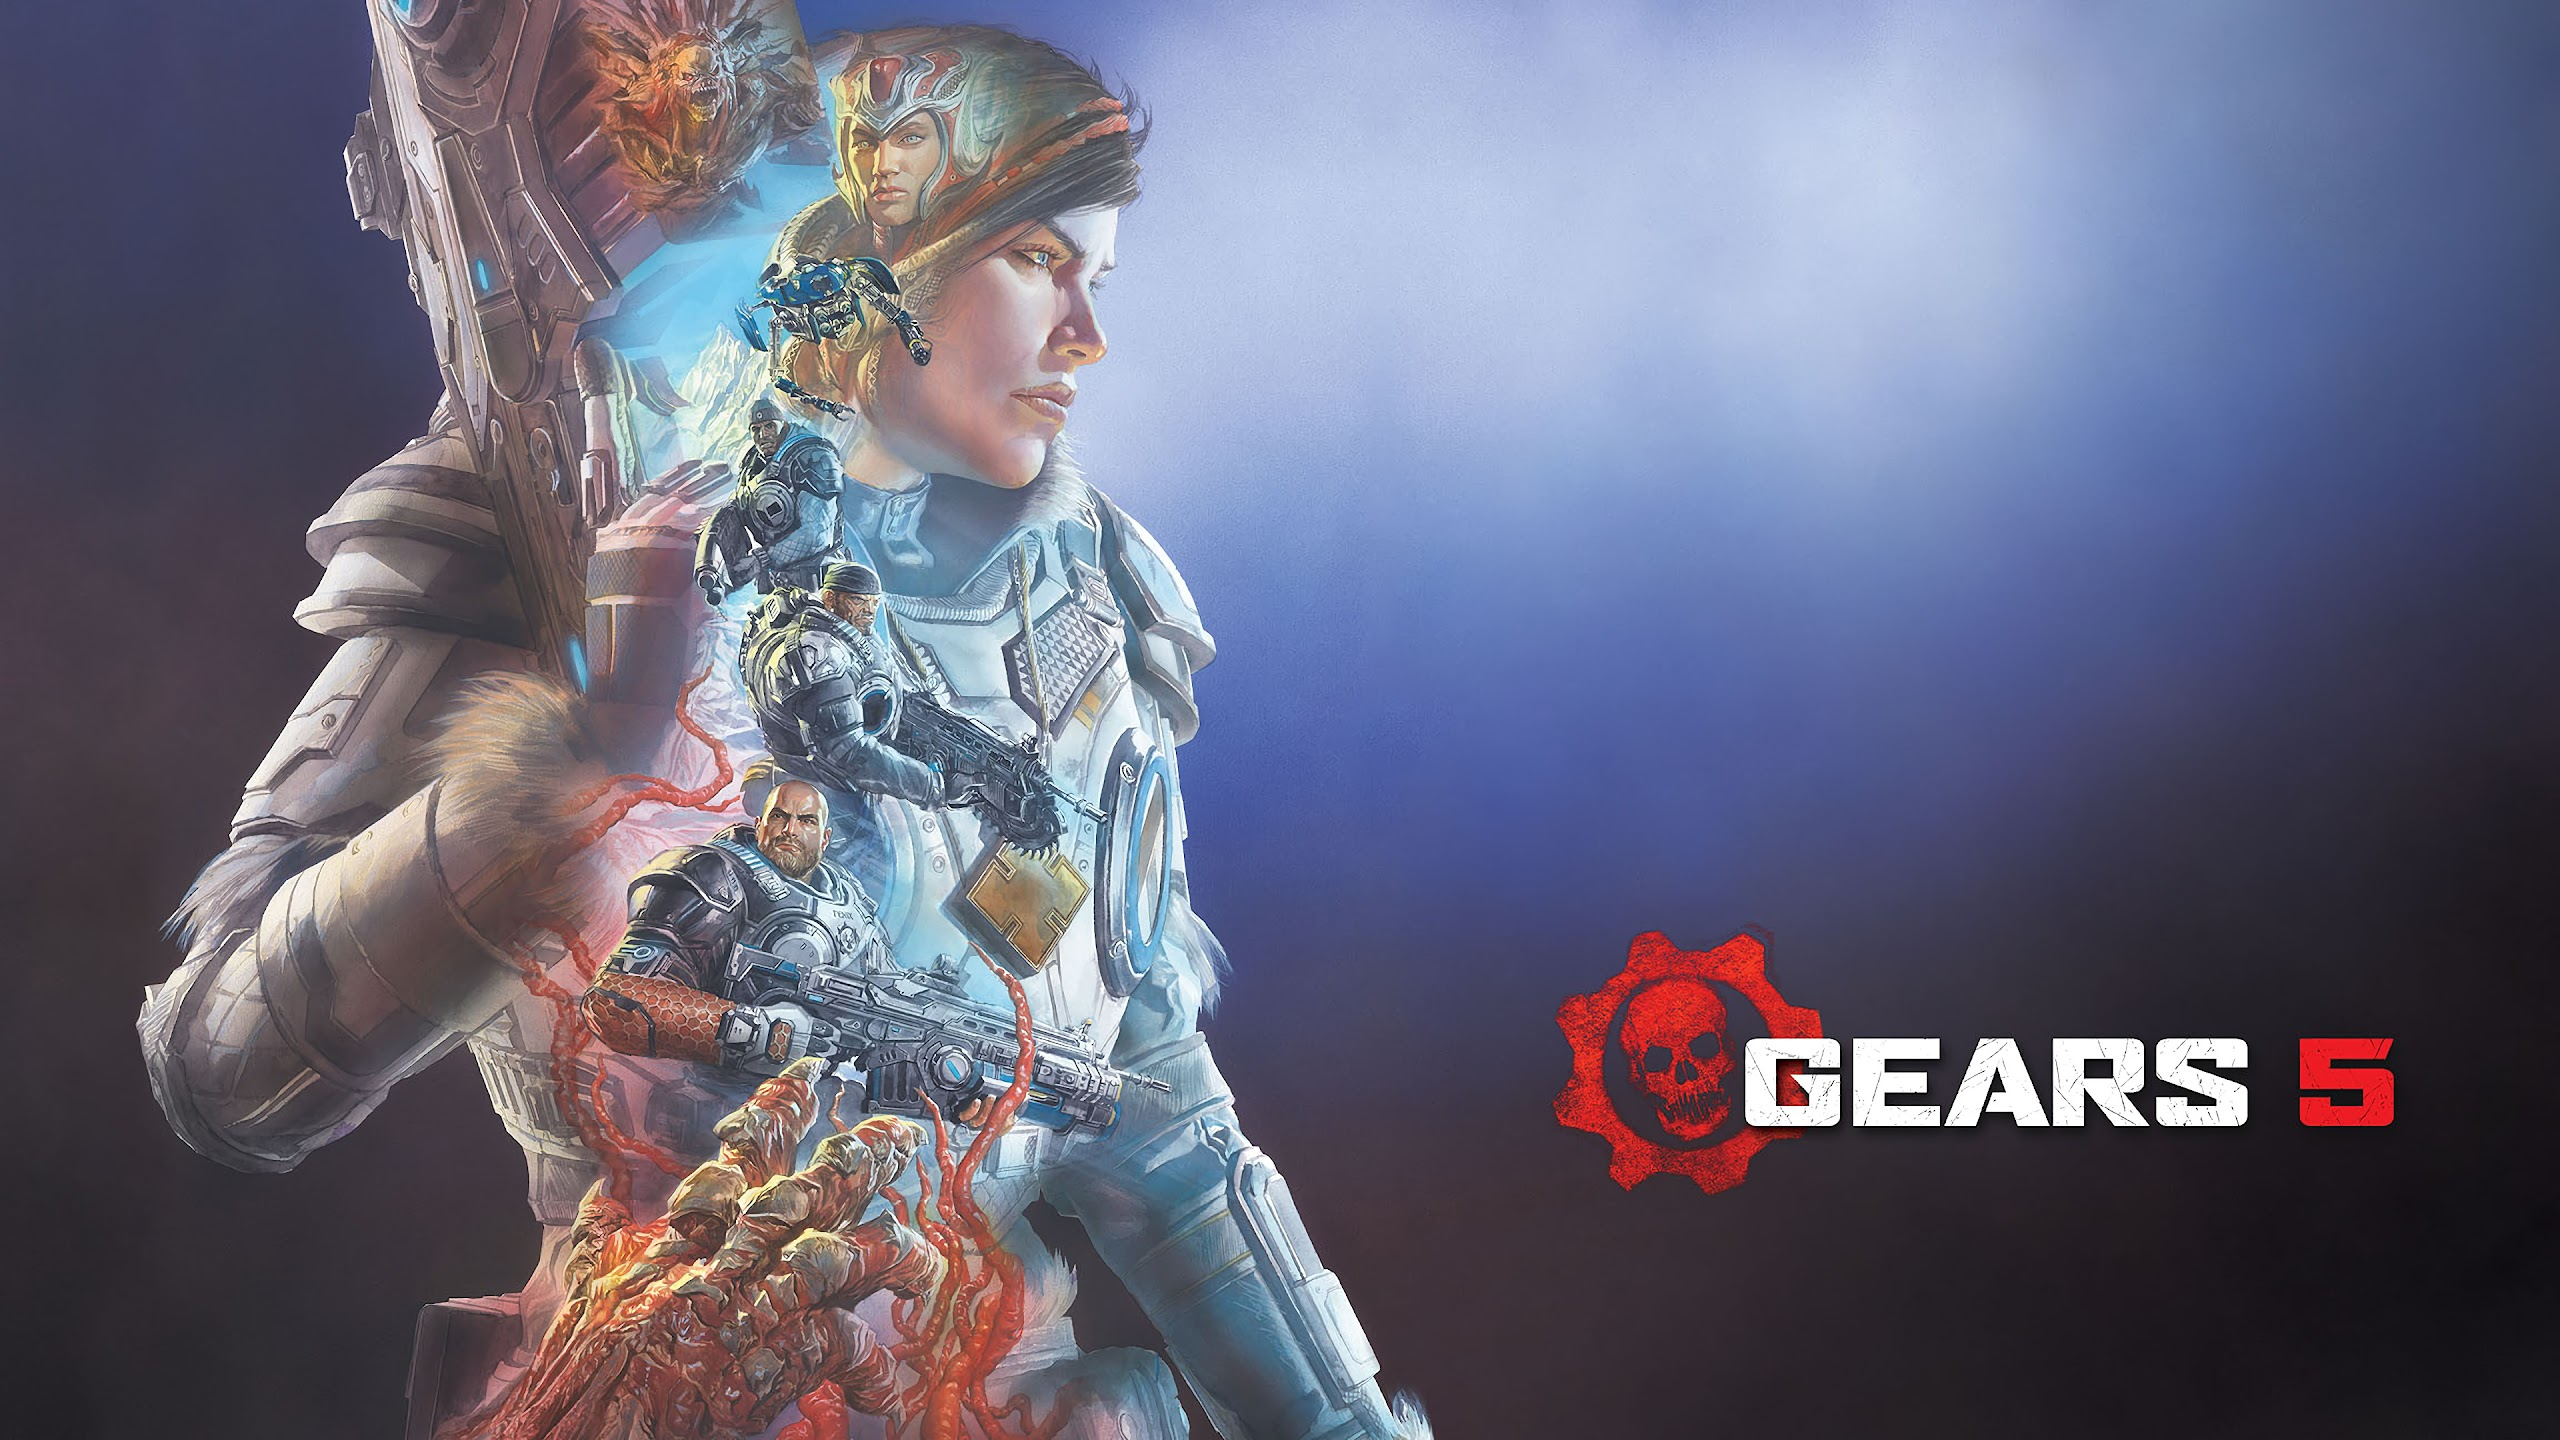 Gears 5 Kait Diaz Characters 4K Wallpaper #13